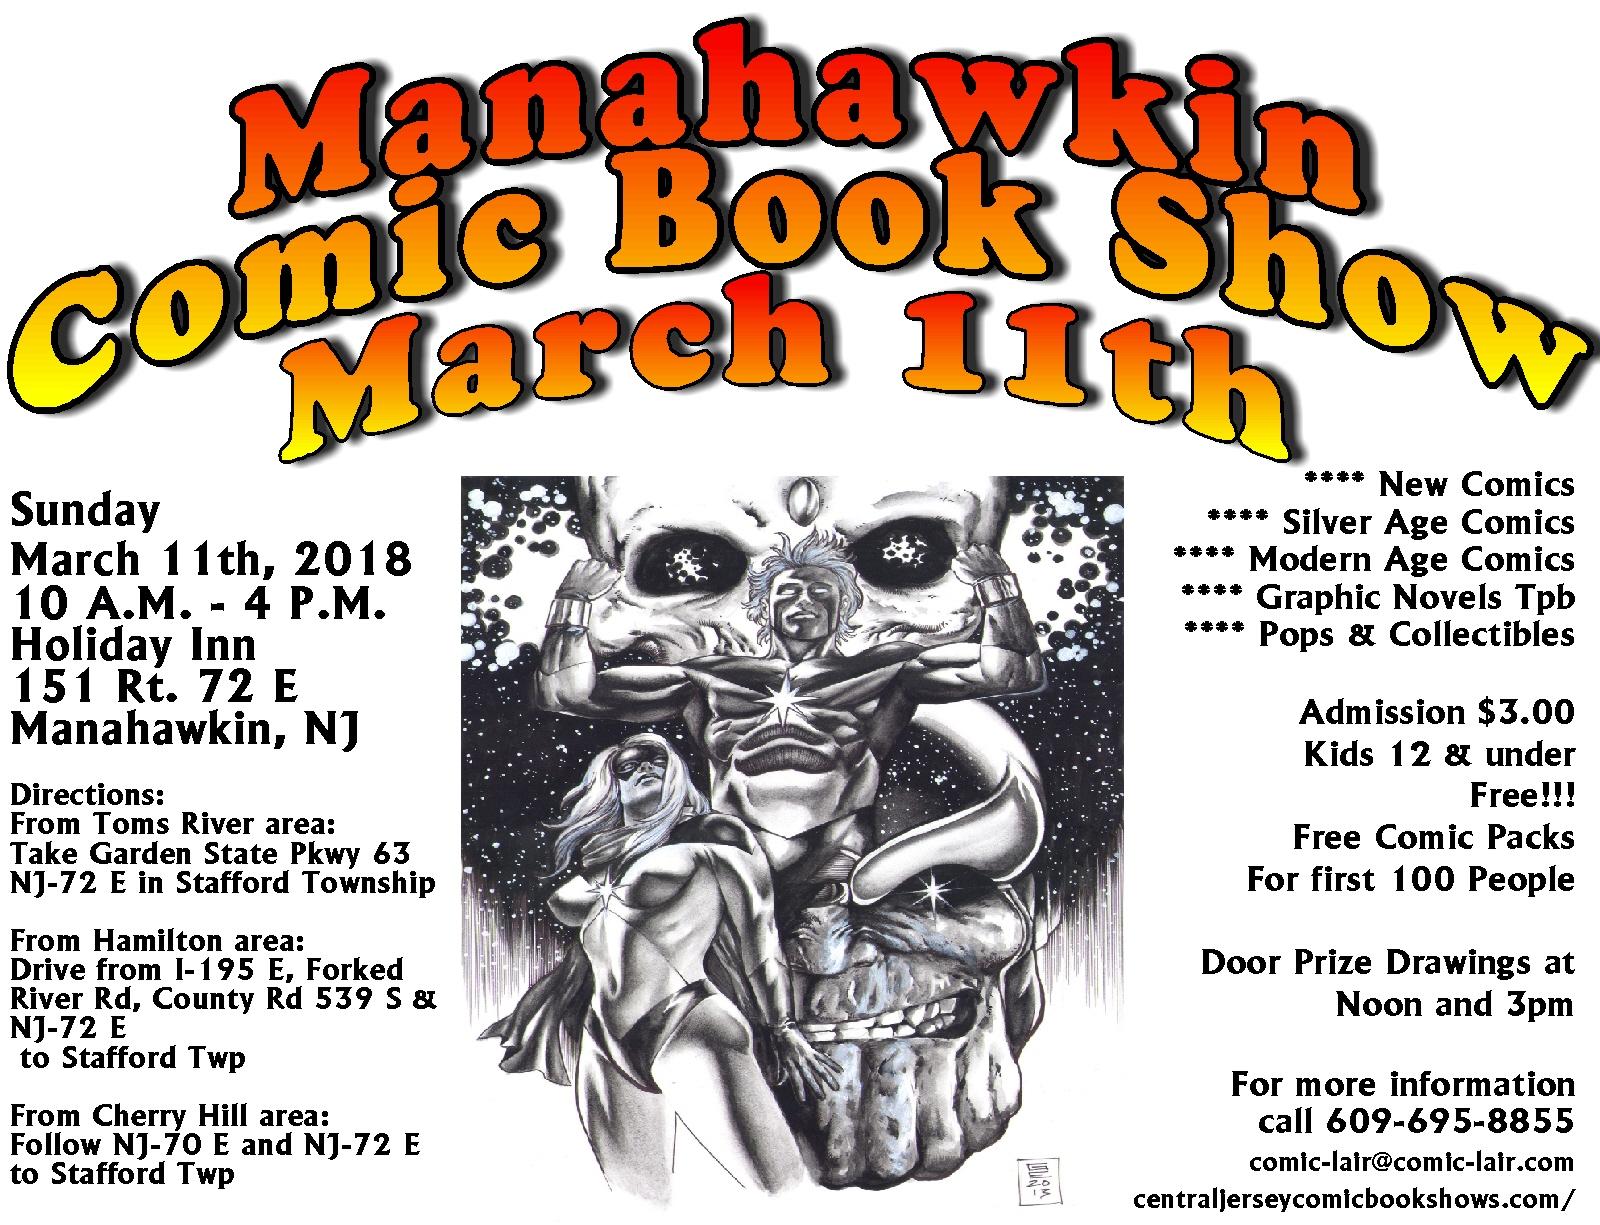 Manahawkin Comic Book Show March 11